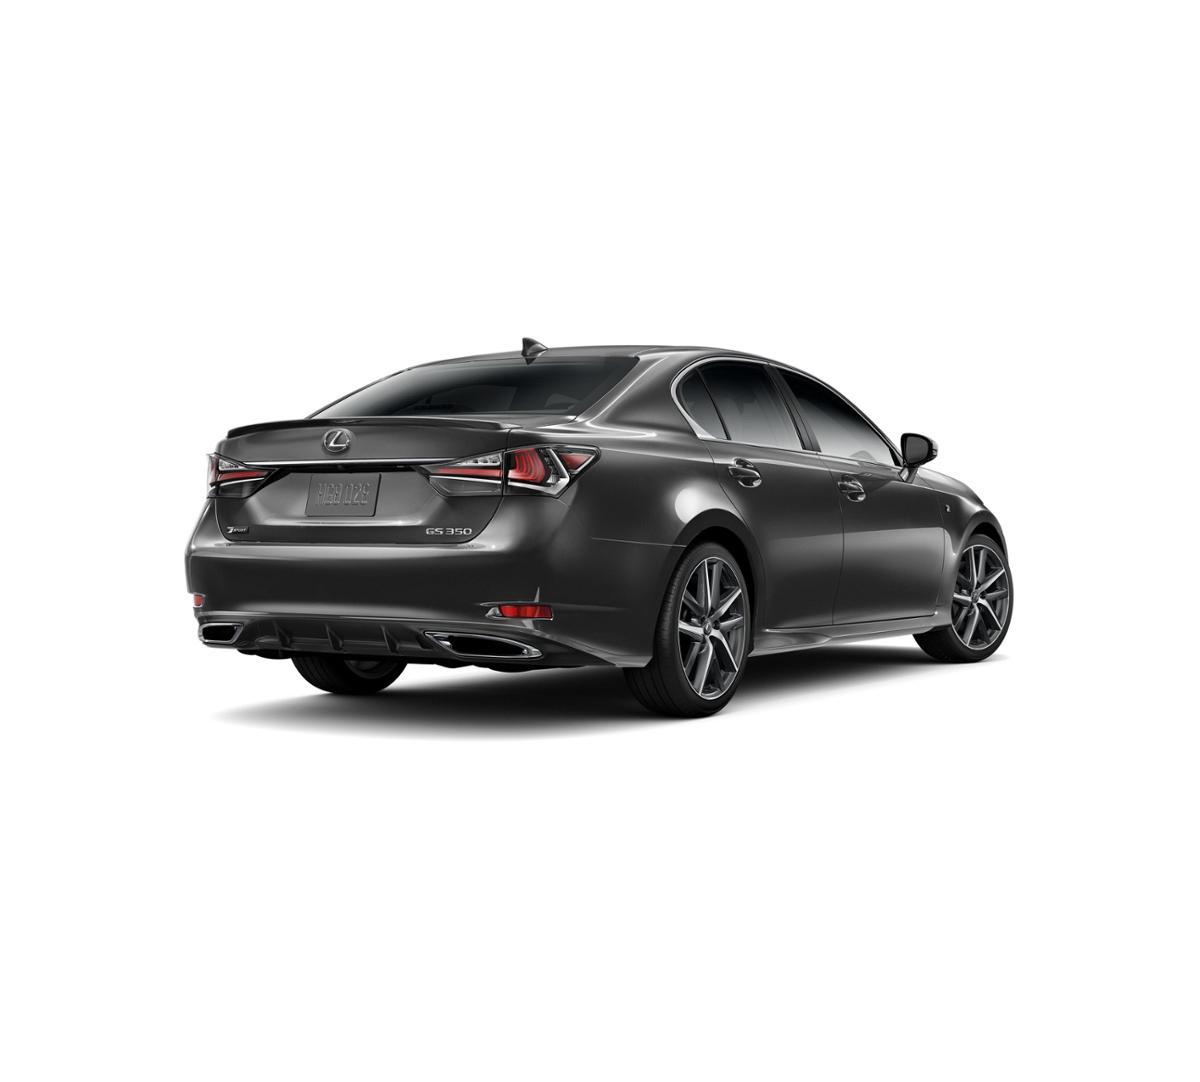 Lexus Gs Lease: Prestige Lexus